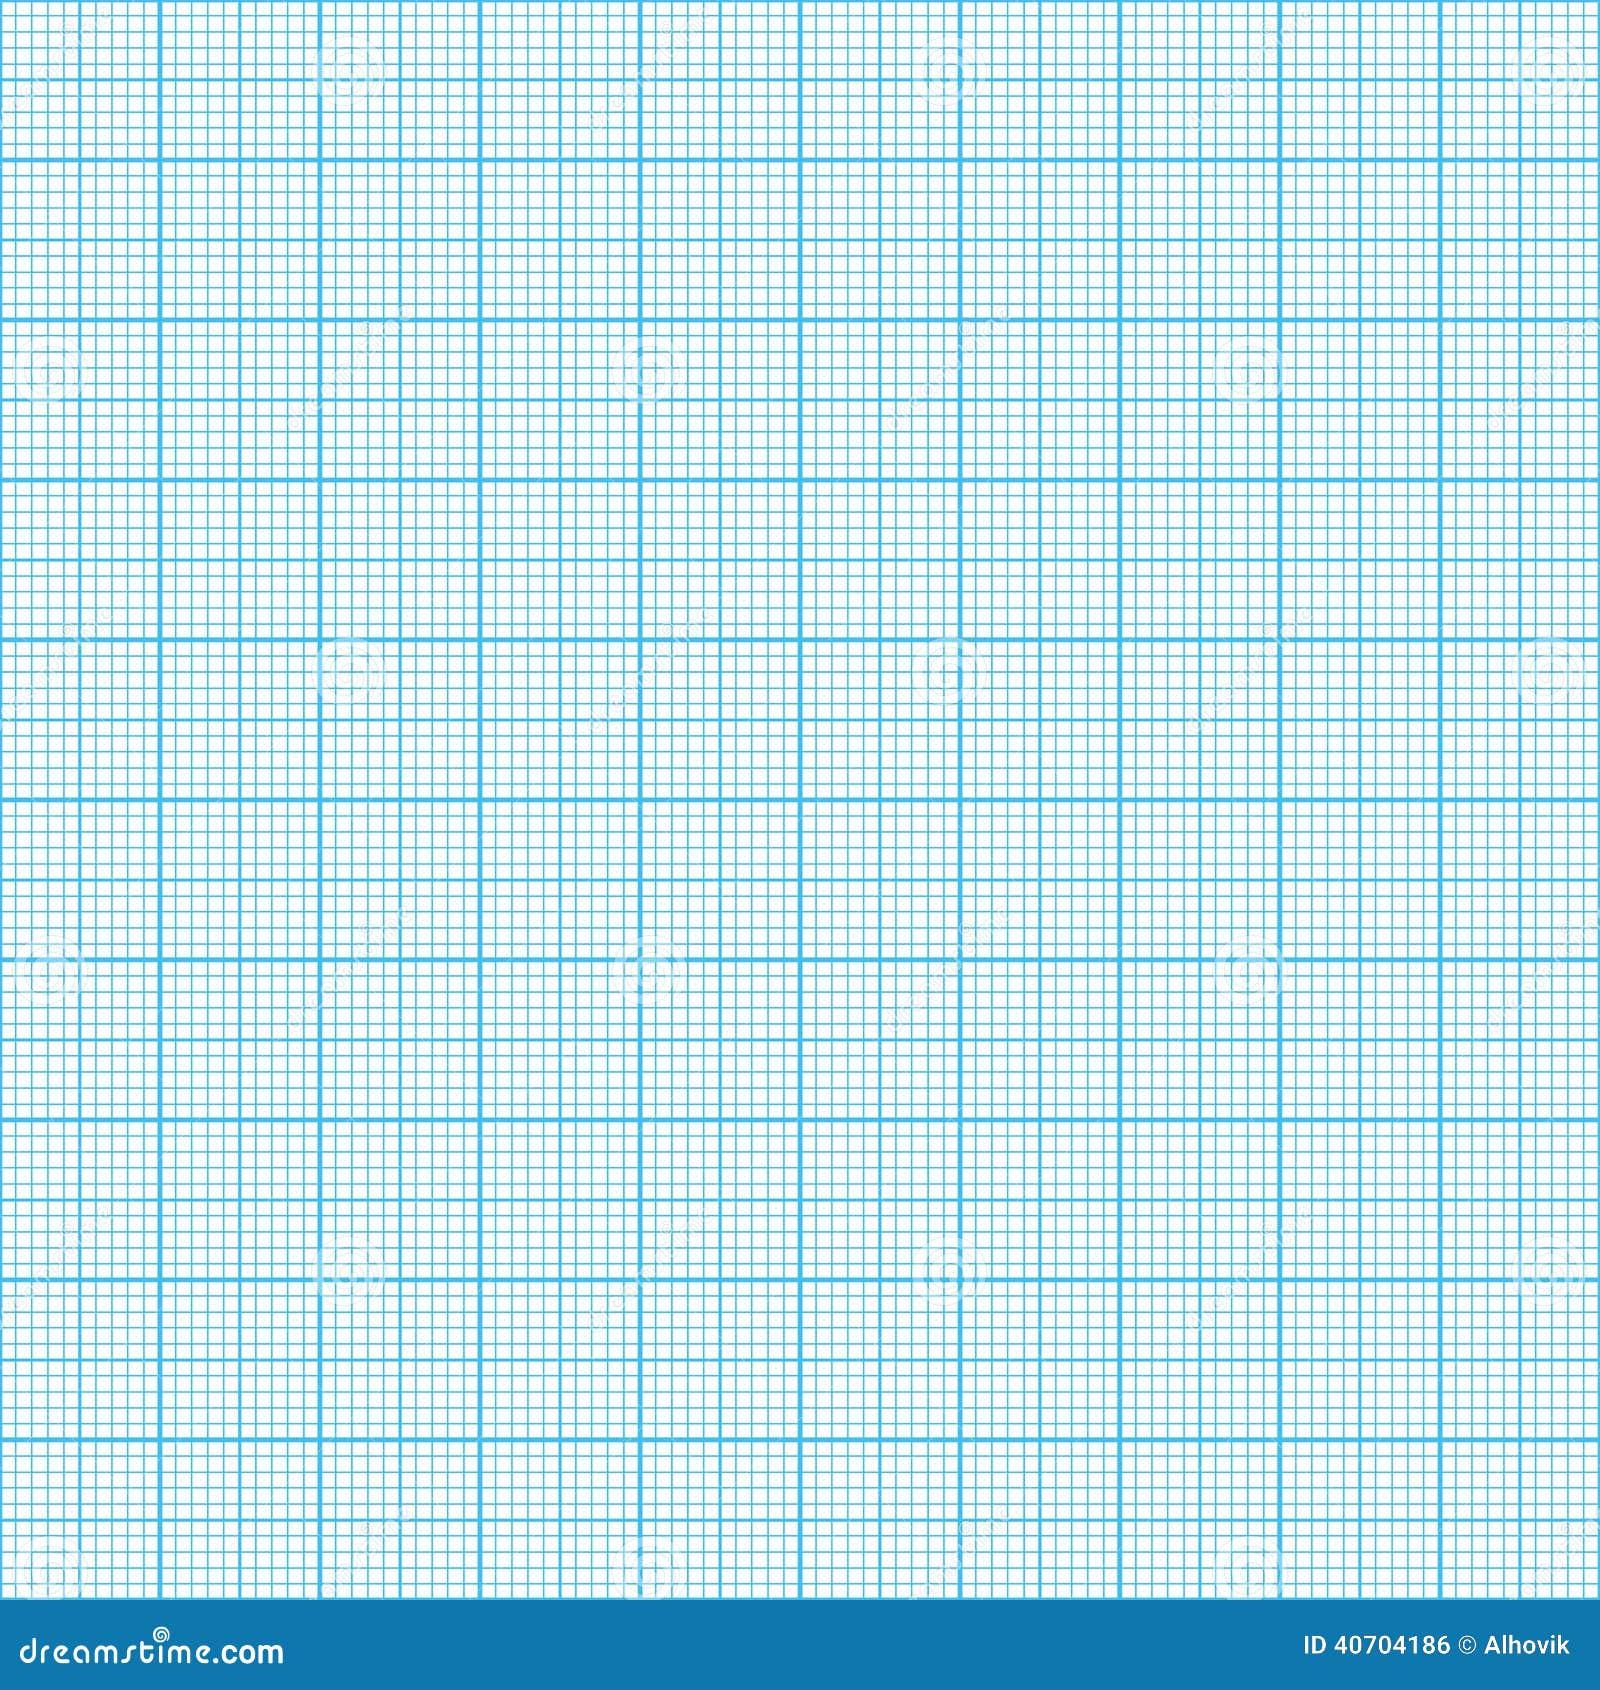 diagramm  millimeterpapier vektor abbildung  illustration